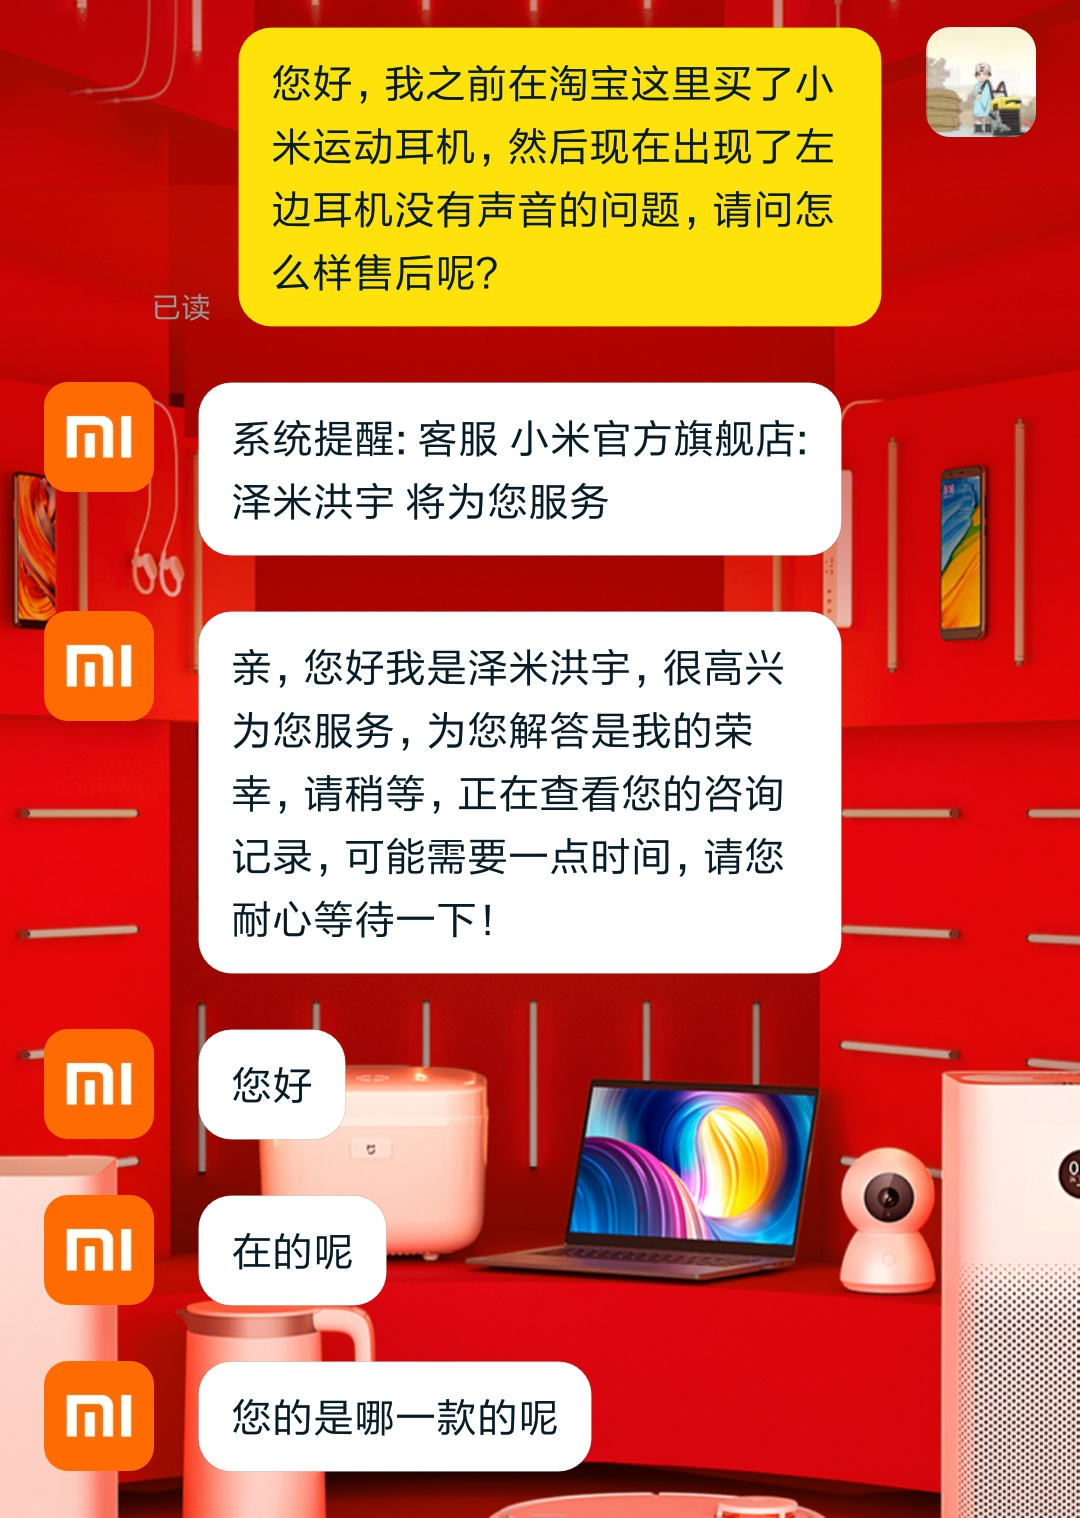 Screenshot_2018-10-16-22-09-36-487_com.taobao.taobao.png